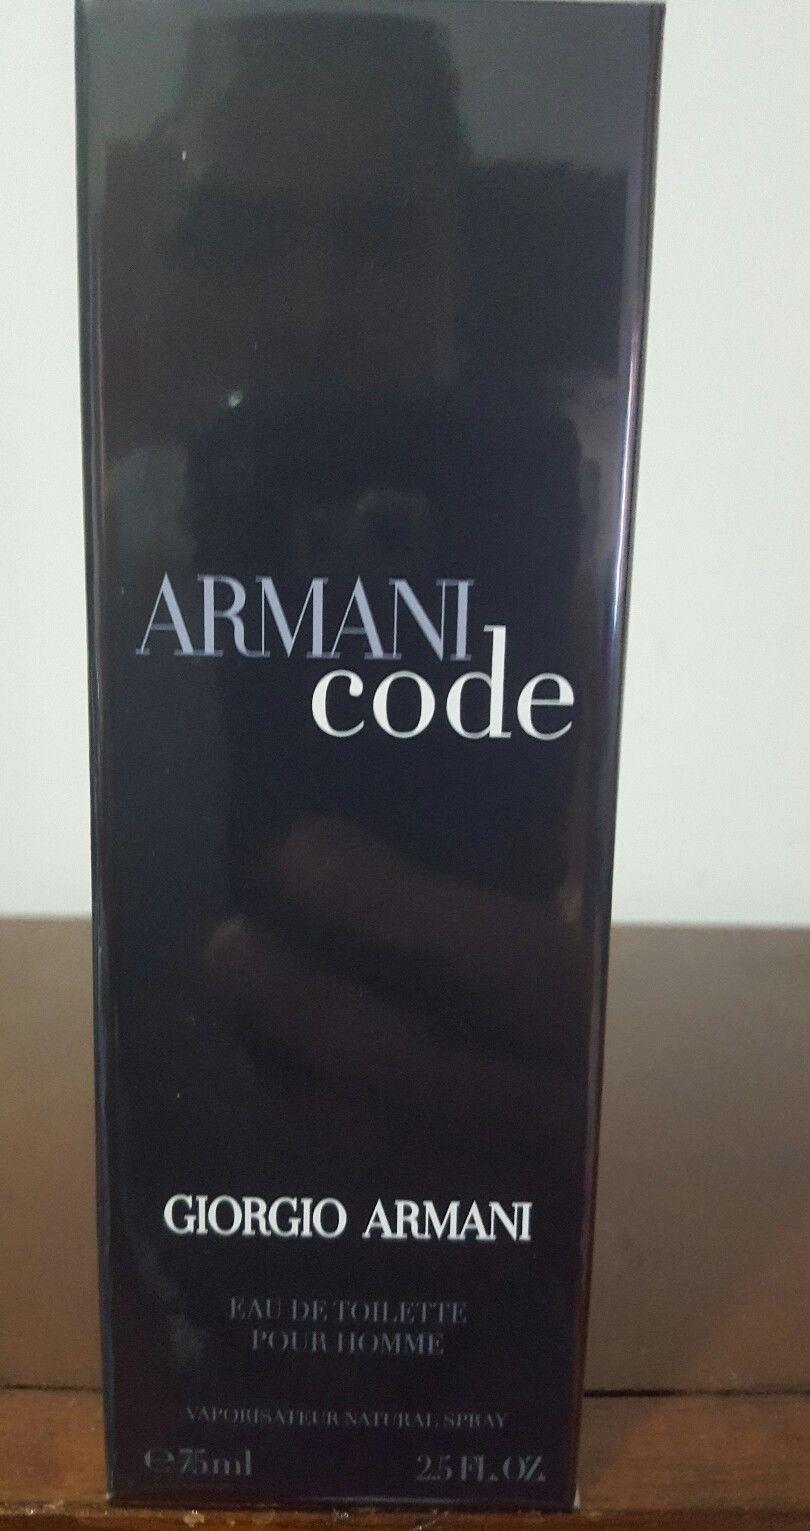 3a4660e73372 37.99 | Armani Code by Giorgio Armani 75ml - 2.5 oz EDT Cologne Spray New